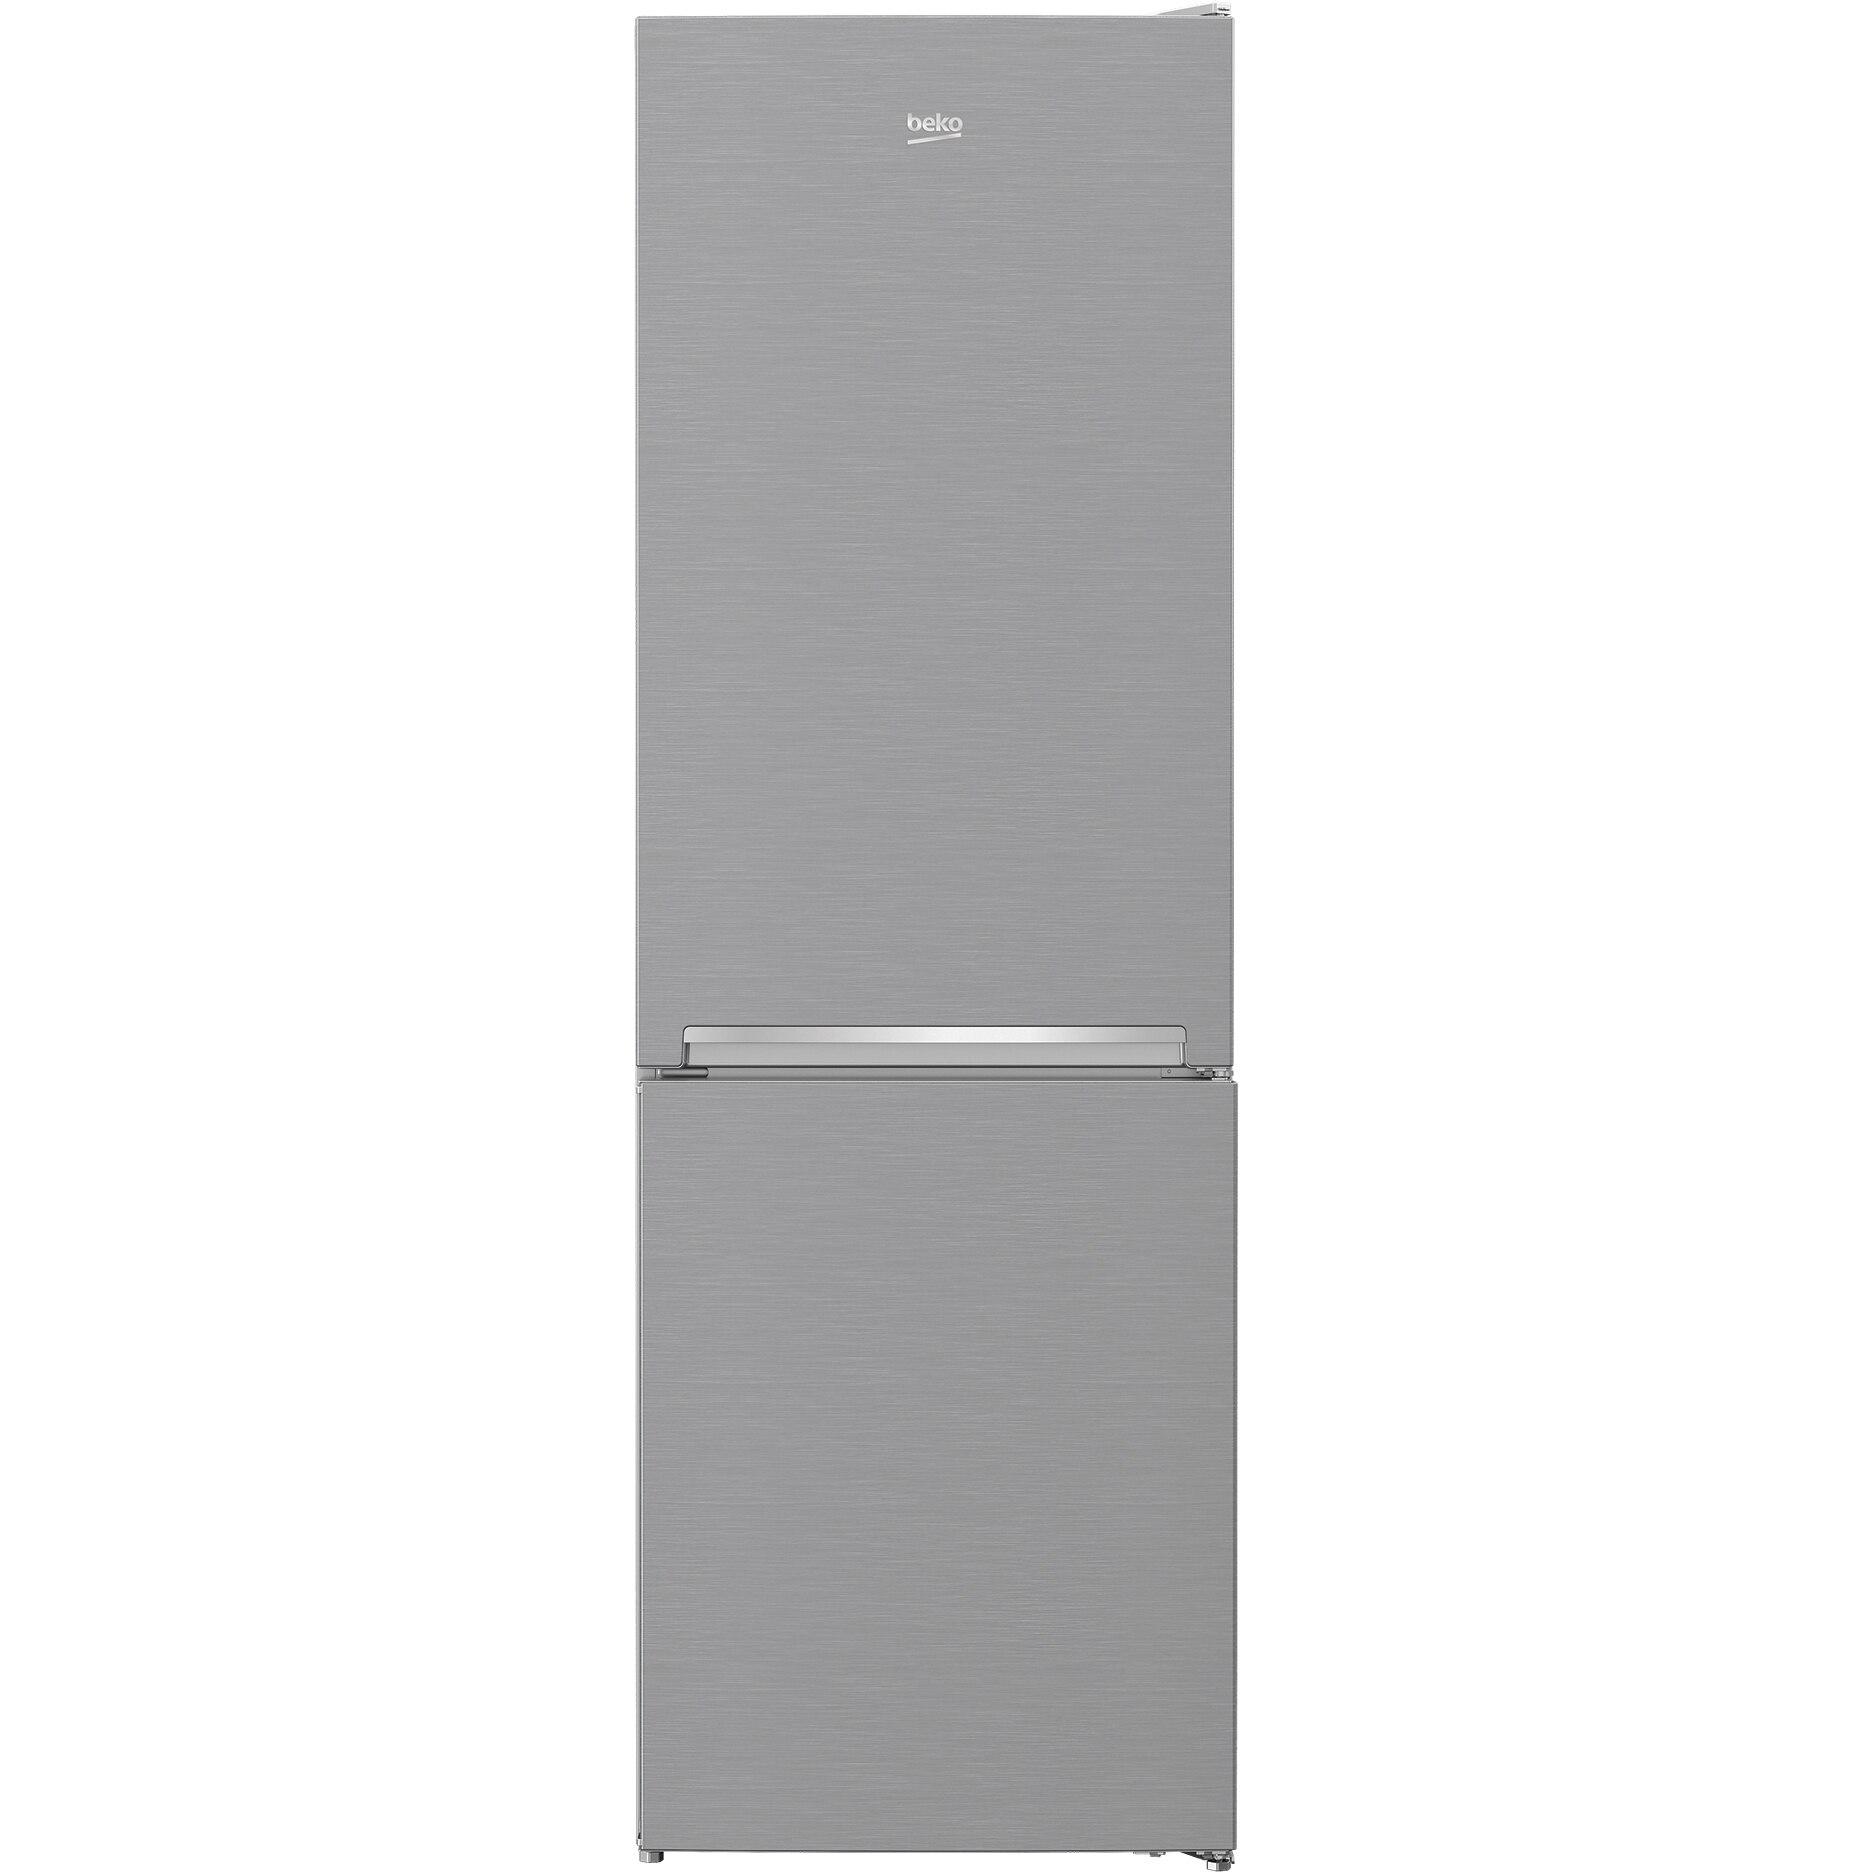 Fotografie Combina frigorifica Beko RCNA366K40XBN, 324 l, Clasa E, NeoFrost, KitchenFit, H 186 cm, Argintiu